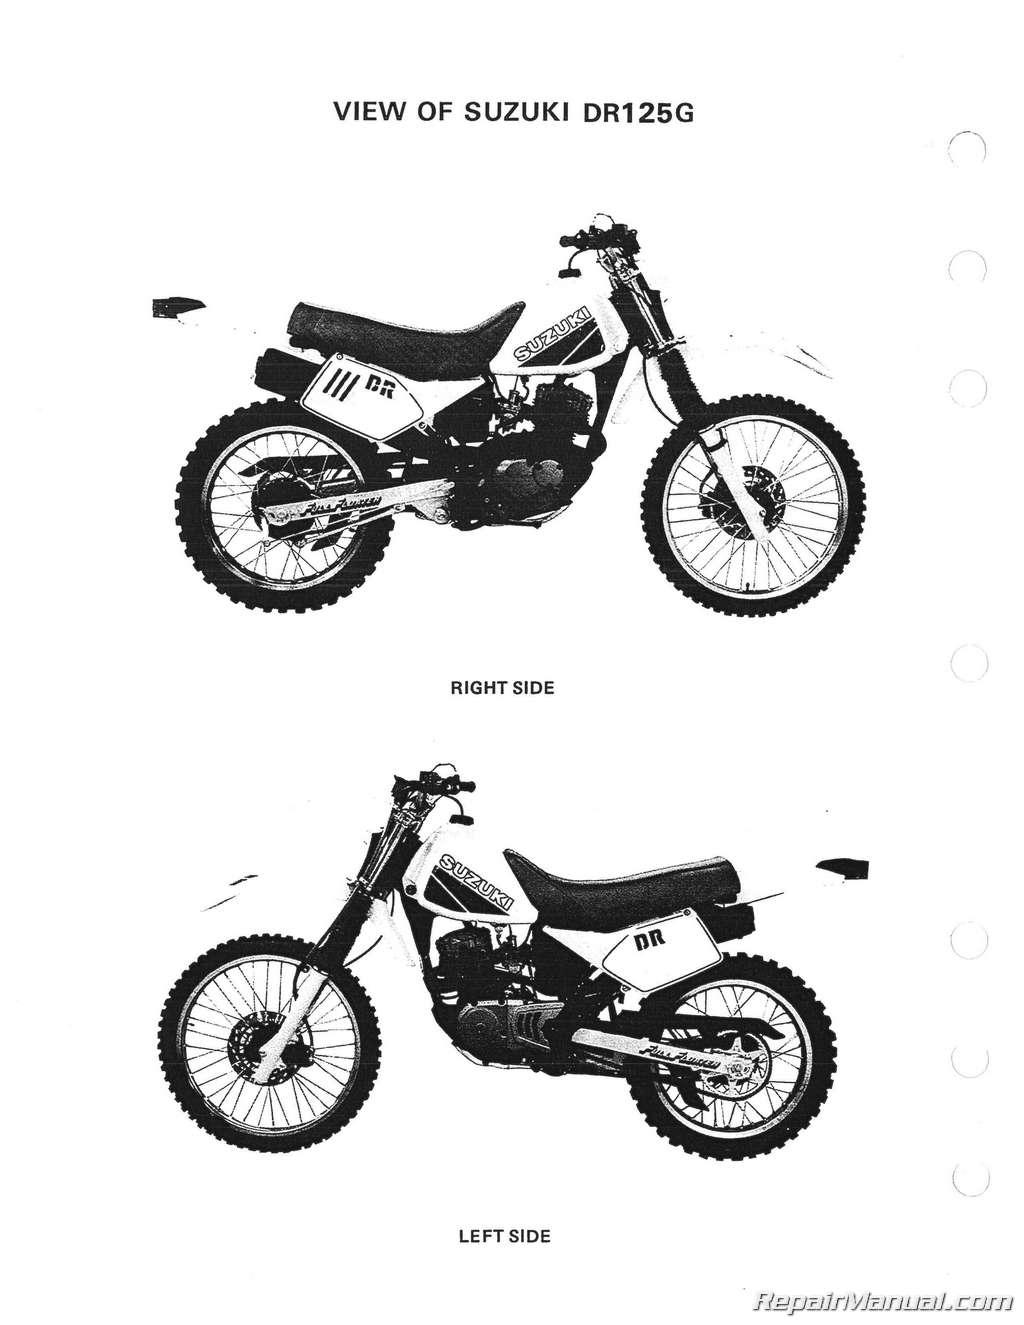 1982 suzuki sp 125 repair manual